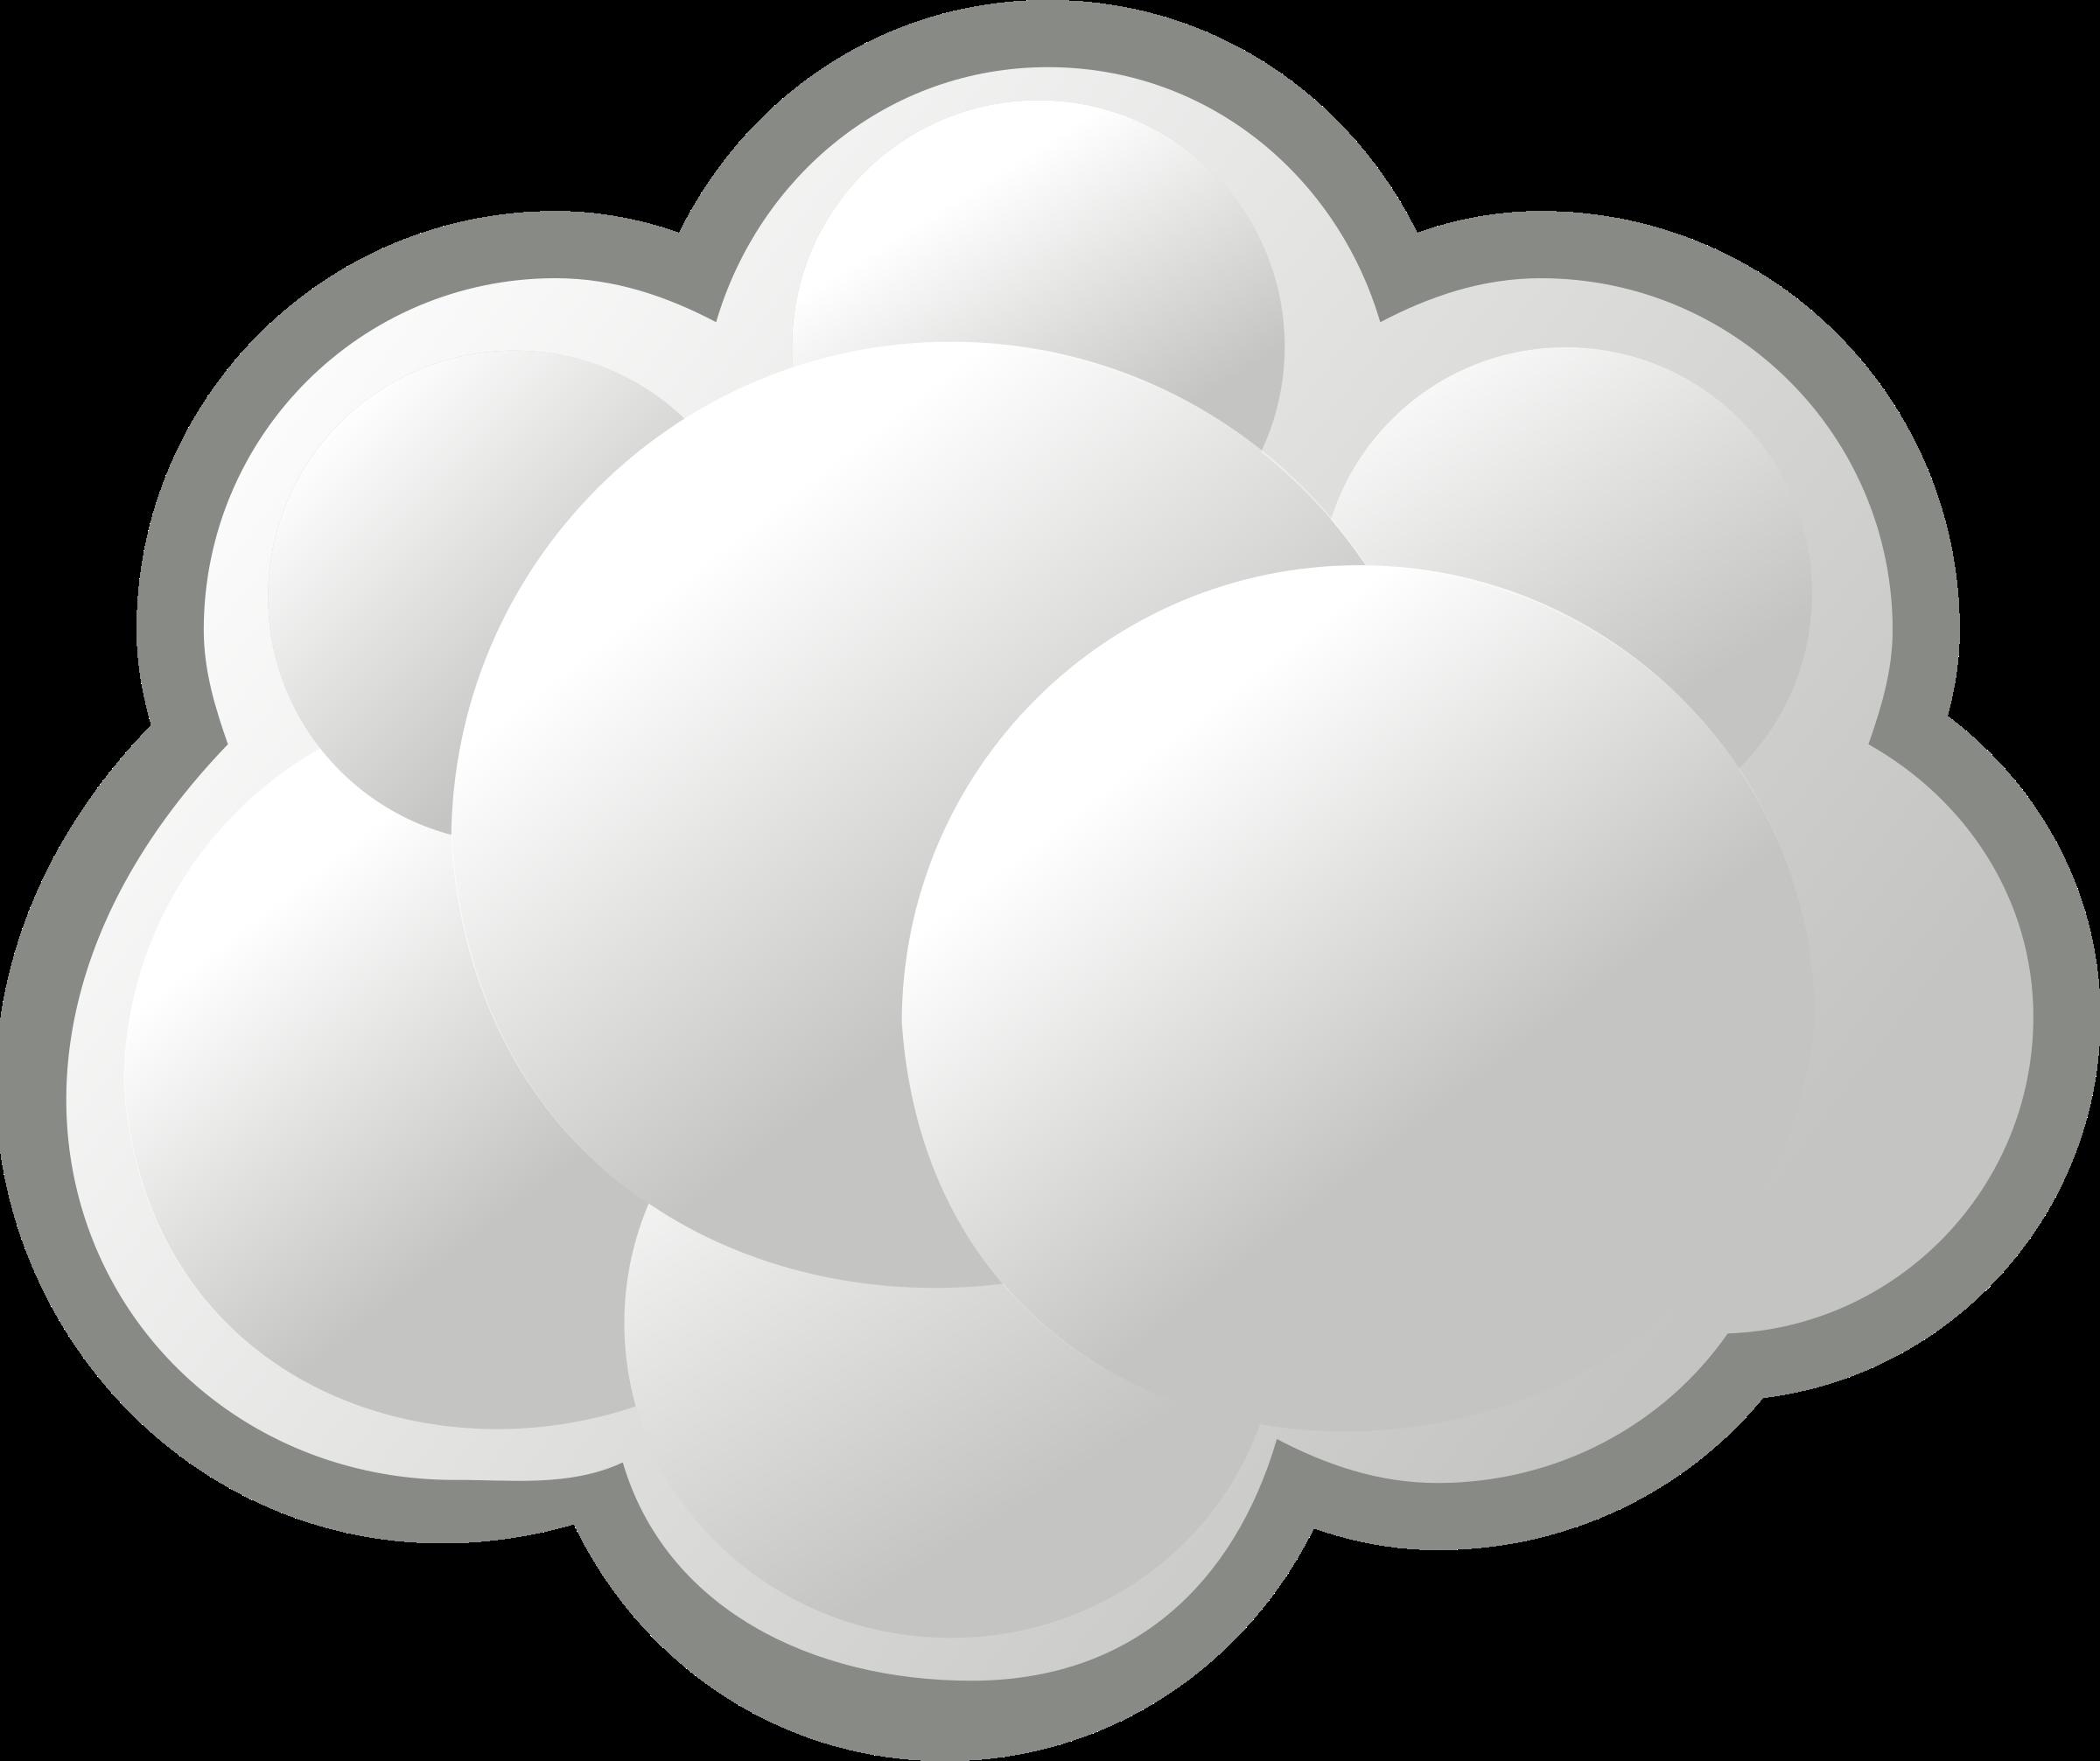 Network clipart cloud, Network cloud Transparent FREE for ... (2400 x 2013 Pixel)